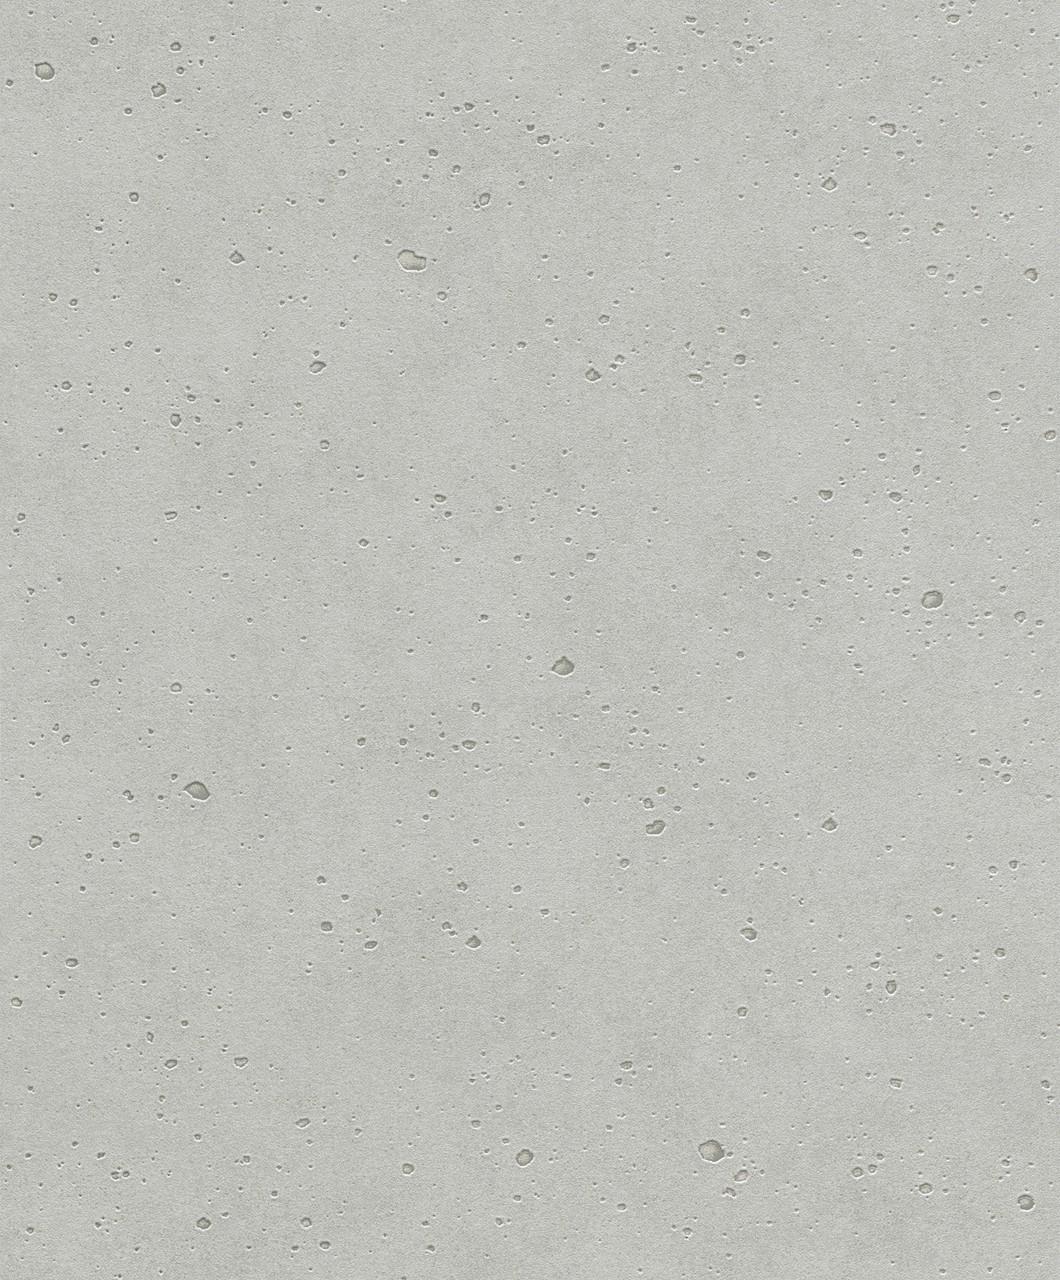 tapete beton beton-optik rasch pure vintage grau 475210